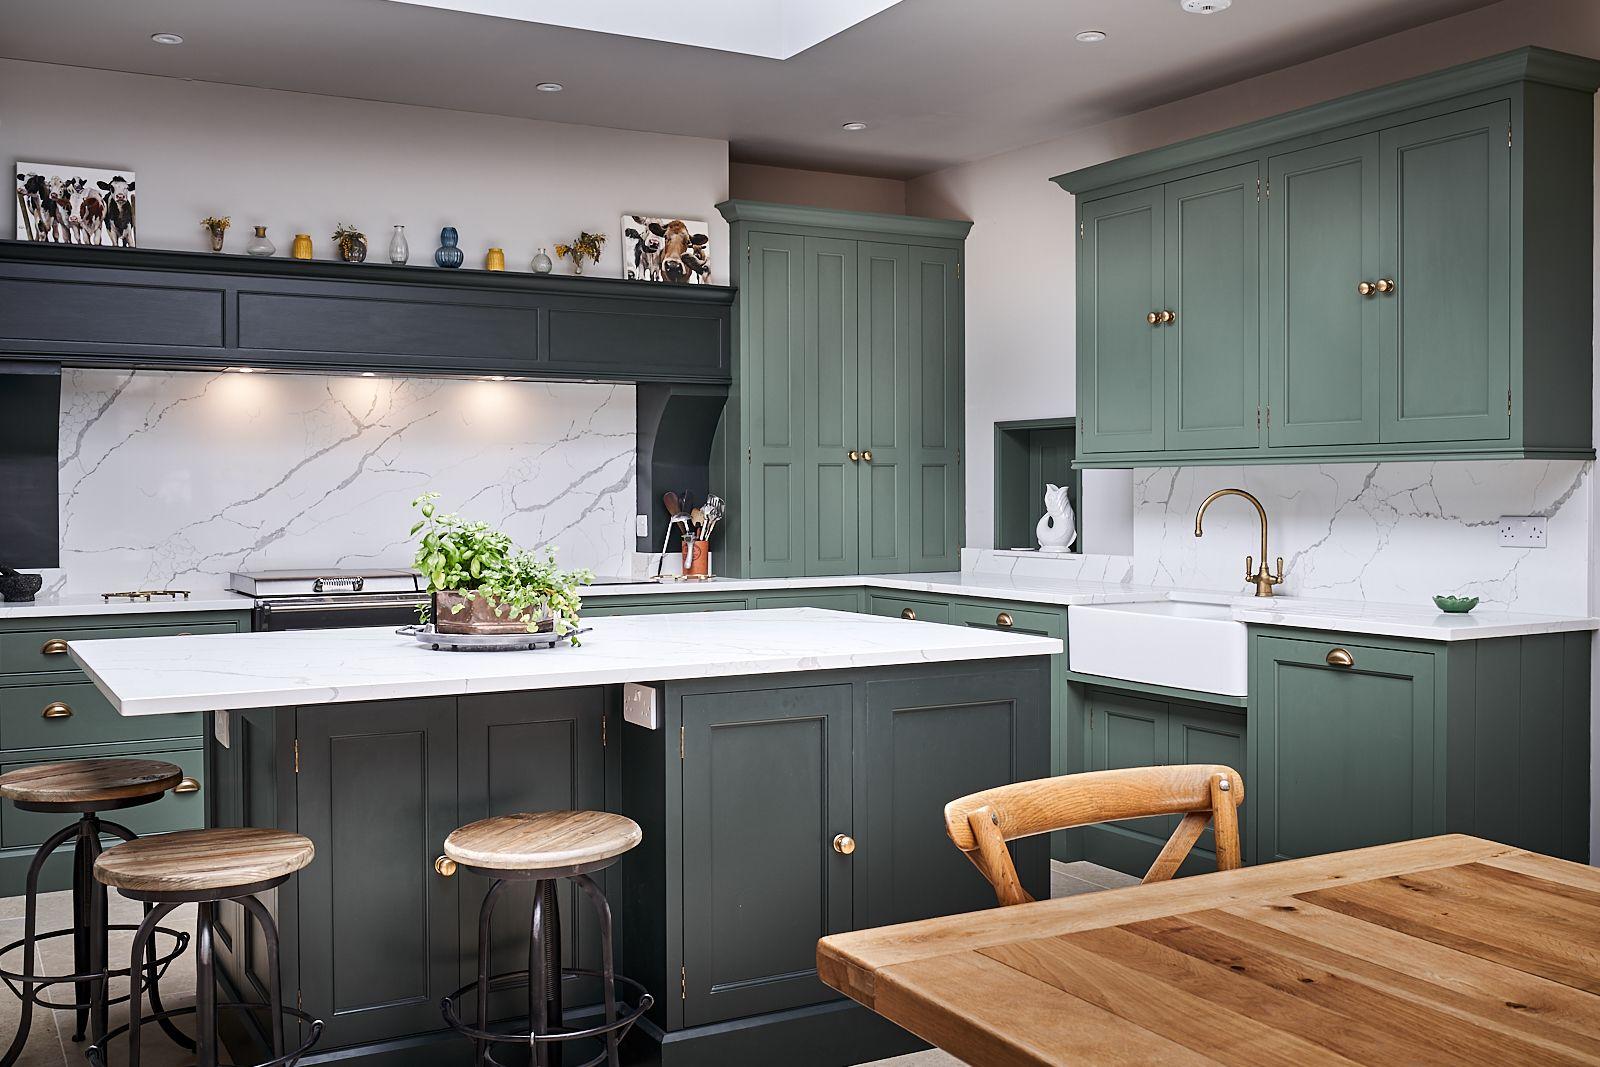 Best Victorian Kitchen Painted In Farrow Ball Studio Green 640 x 480